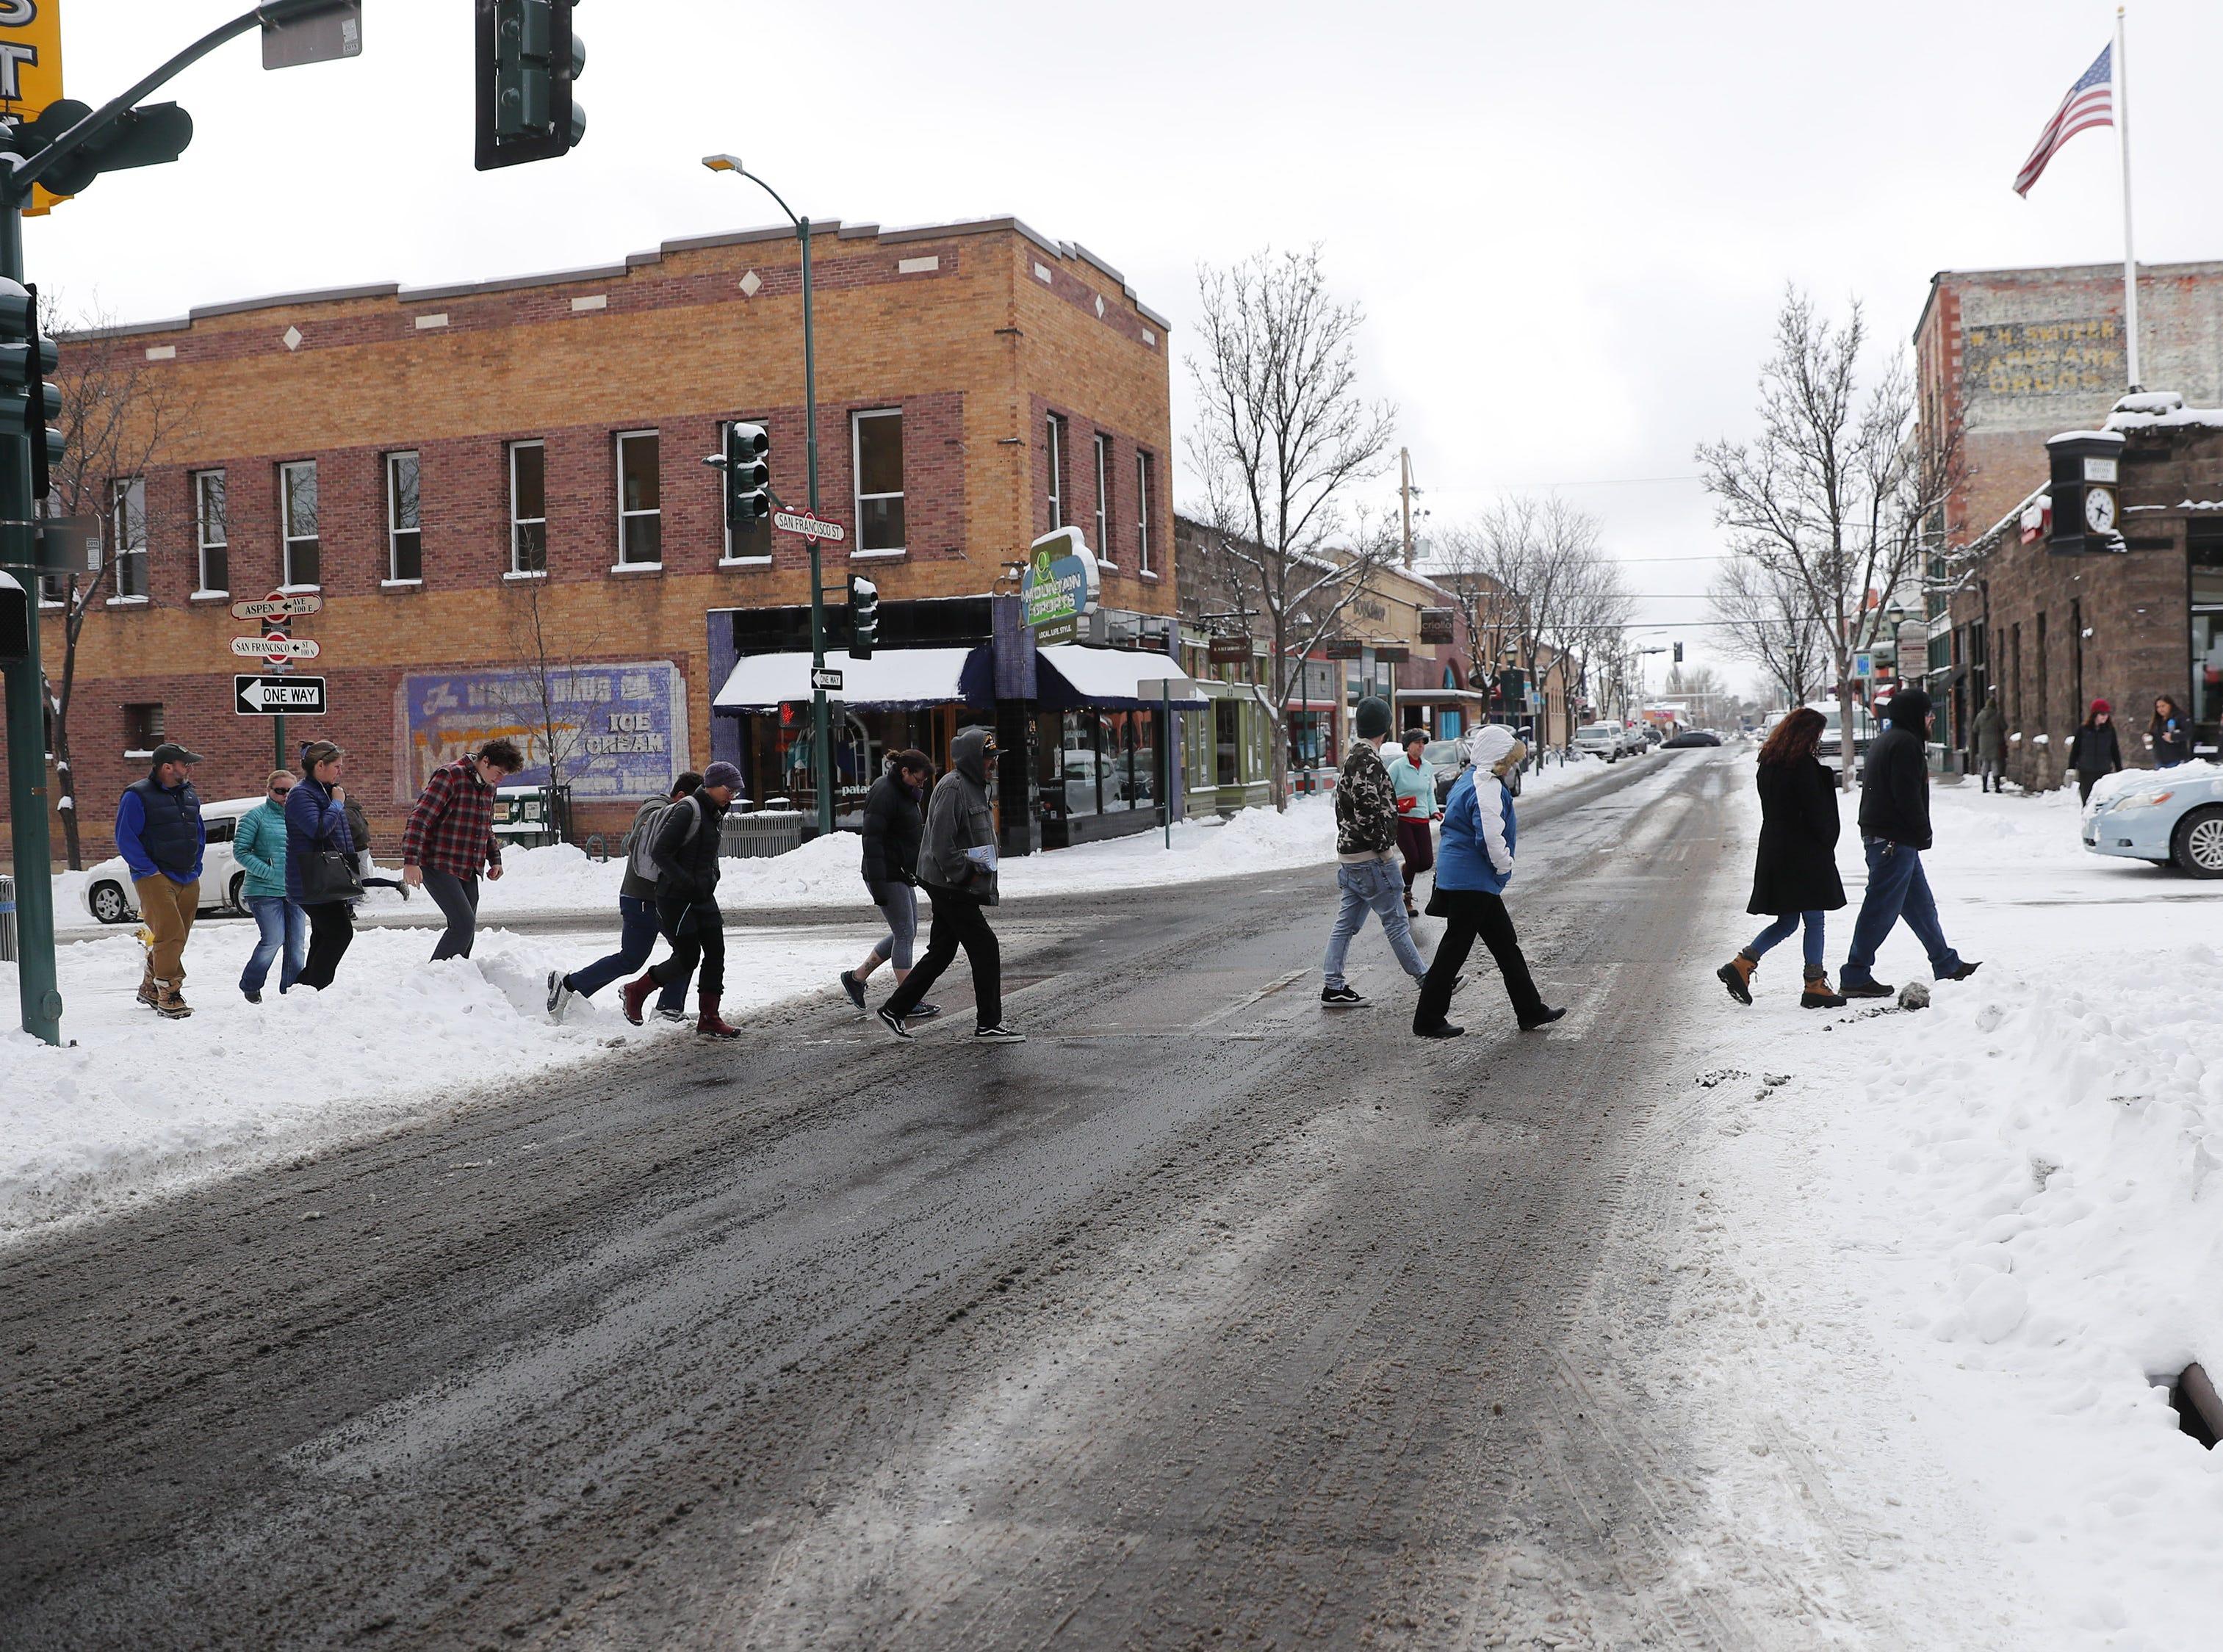 Pedestrians cross San Francisco Street in Flagstaff Feb. 18, 2019.